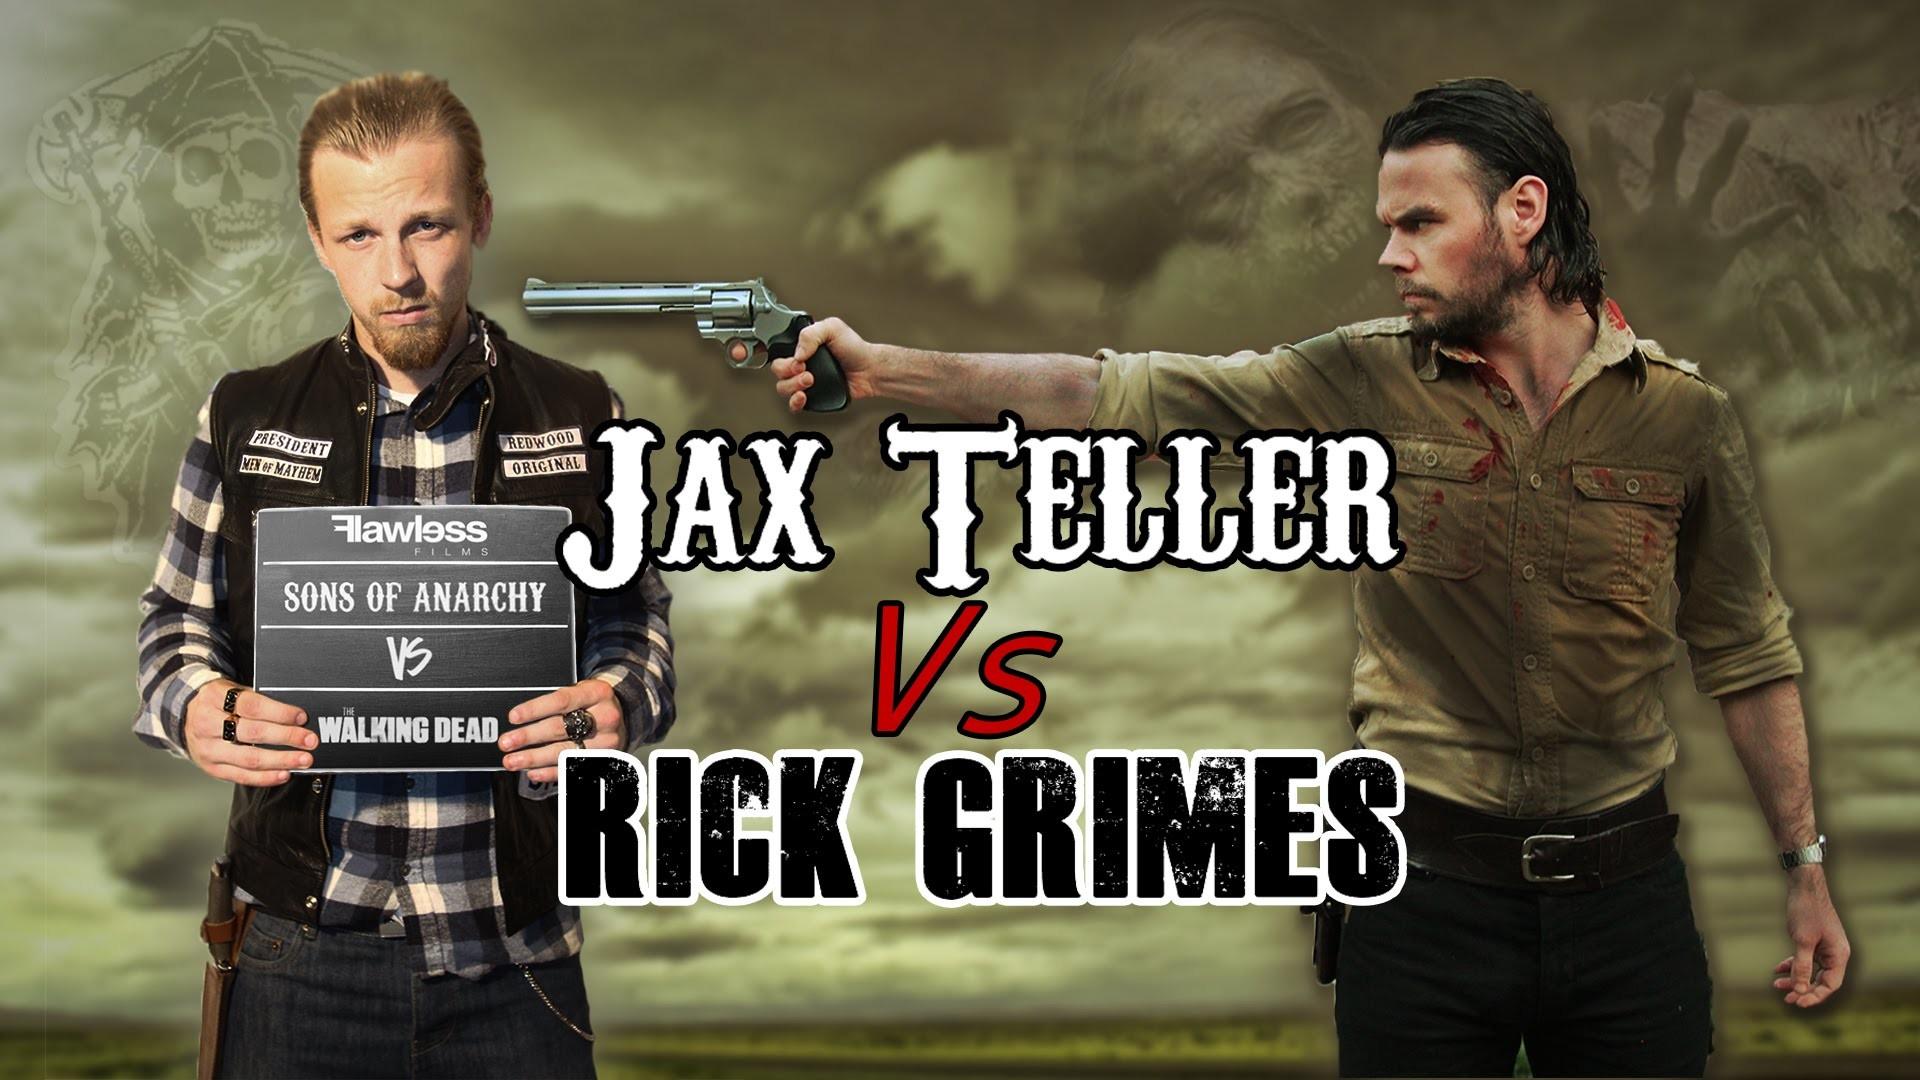 Jax Teller Vs Rick Grimes | Sons of Anarchy Vs The Walking Dead – YouTube